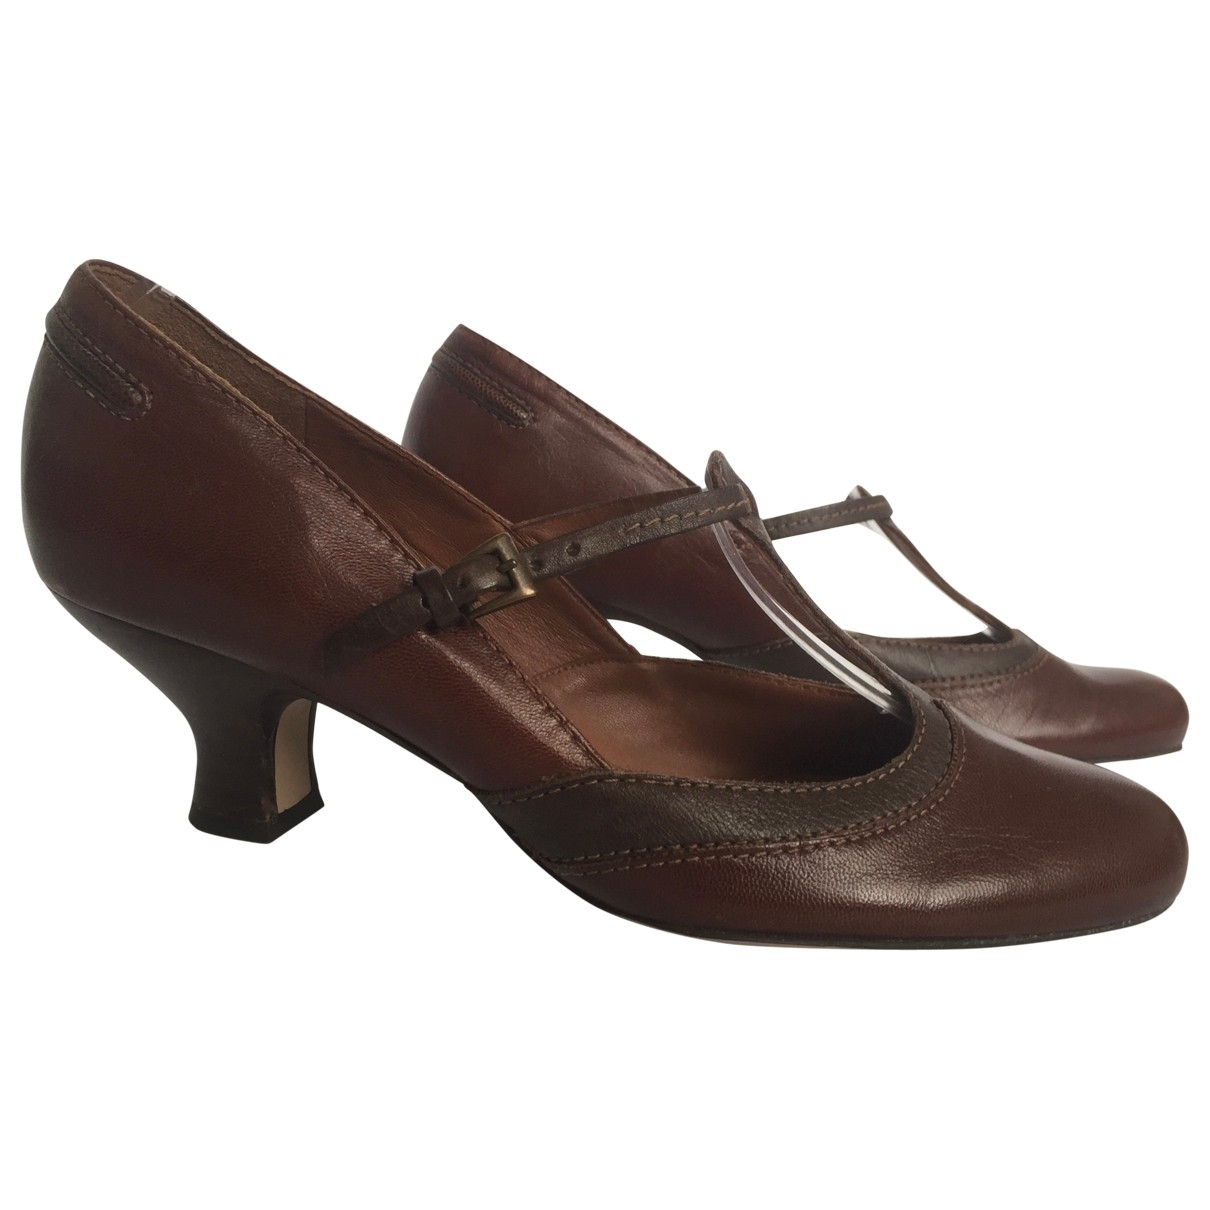 Clarks \N Brown Leather Heels for Women 6.5 UK